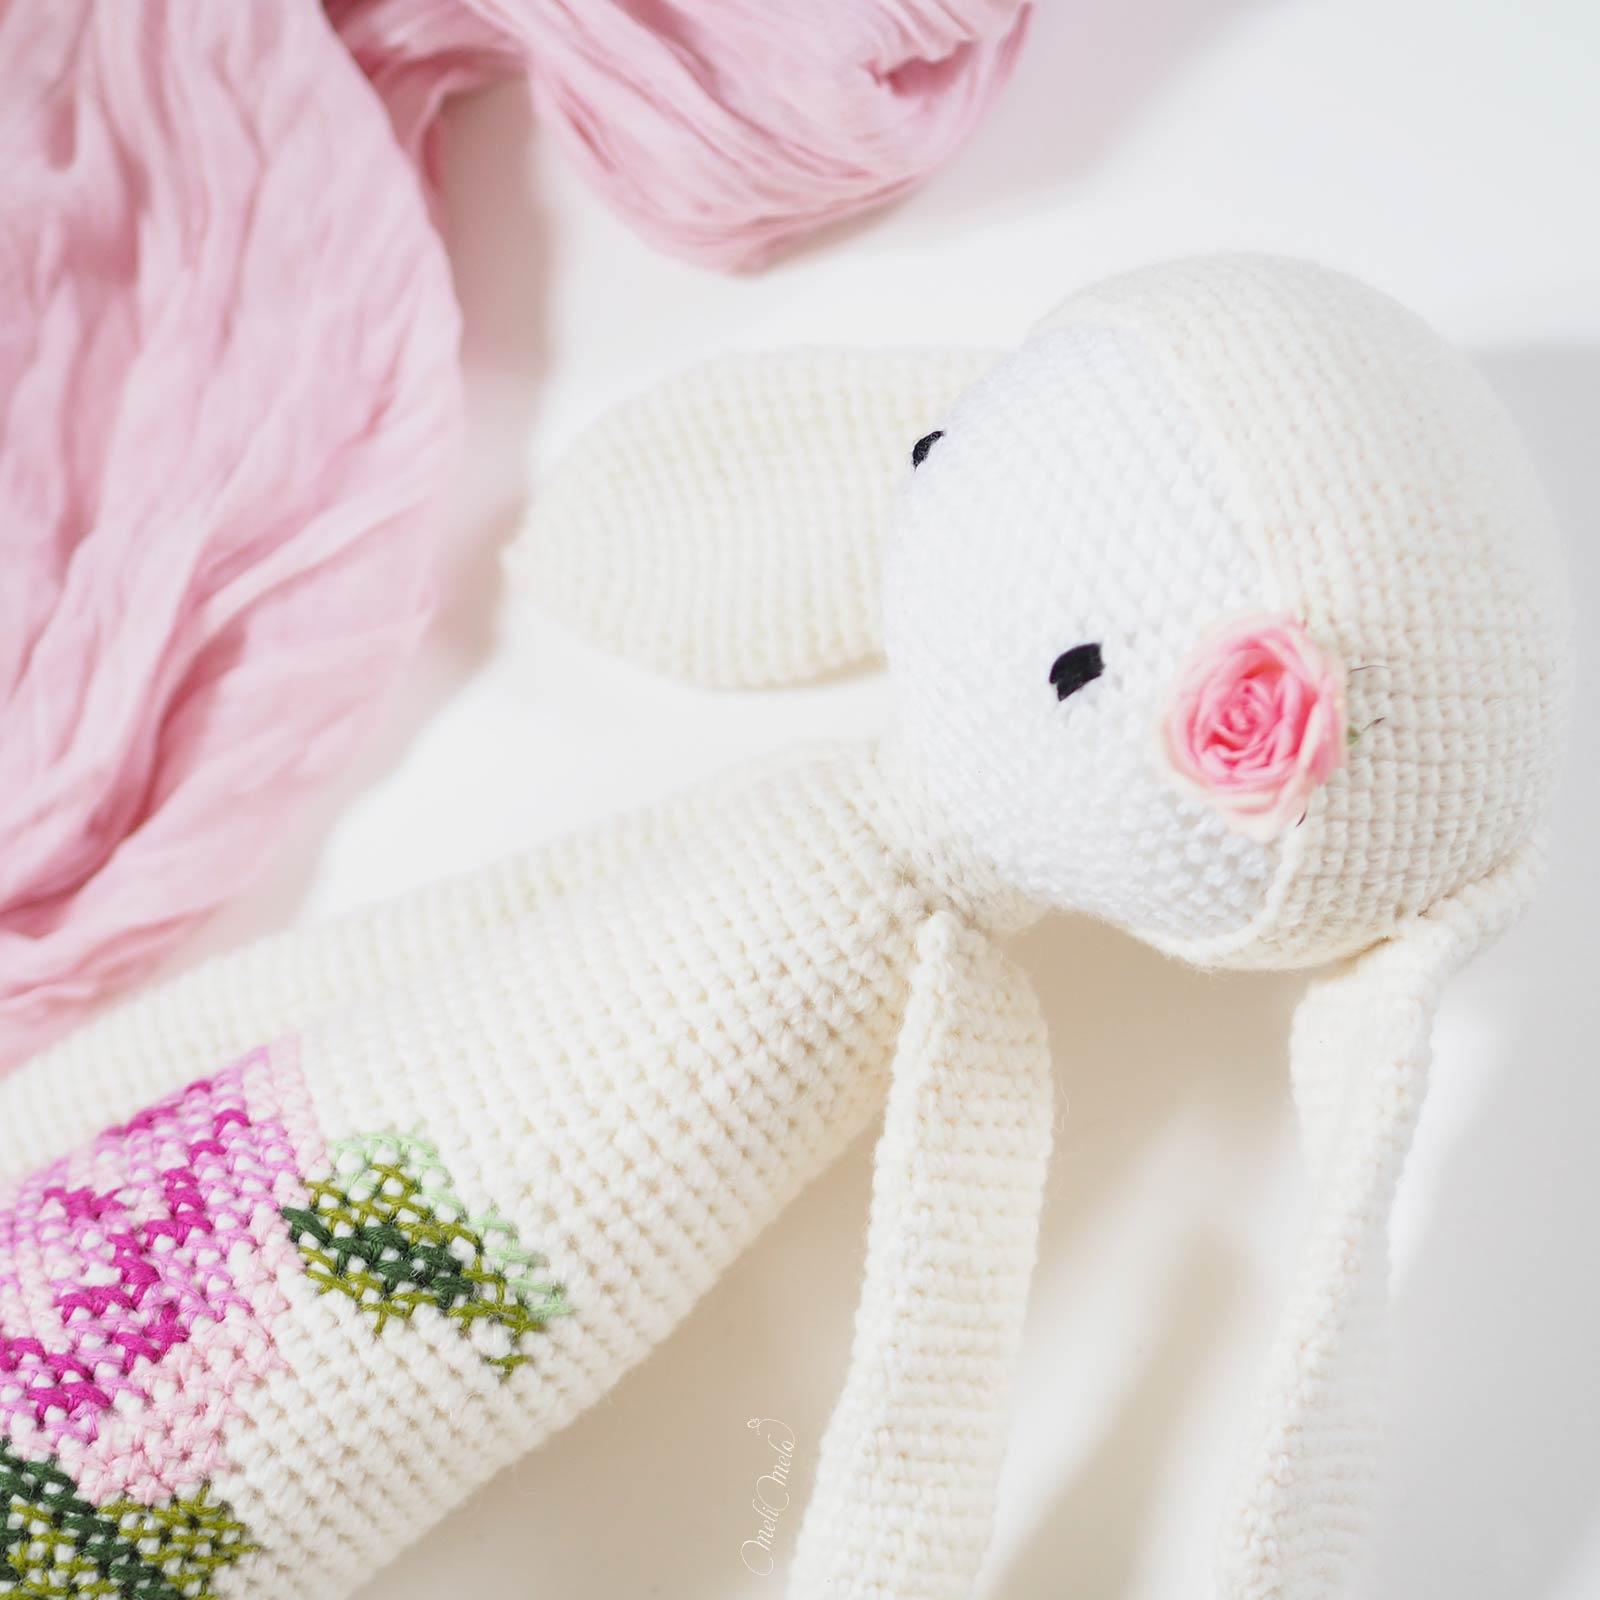 crochet lapine détail bunny rita Lalylala bouquet rose laine alpaca chunky ricodesign laboutiquedemelimelo